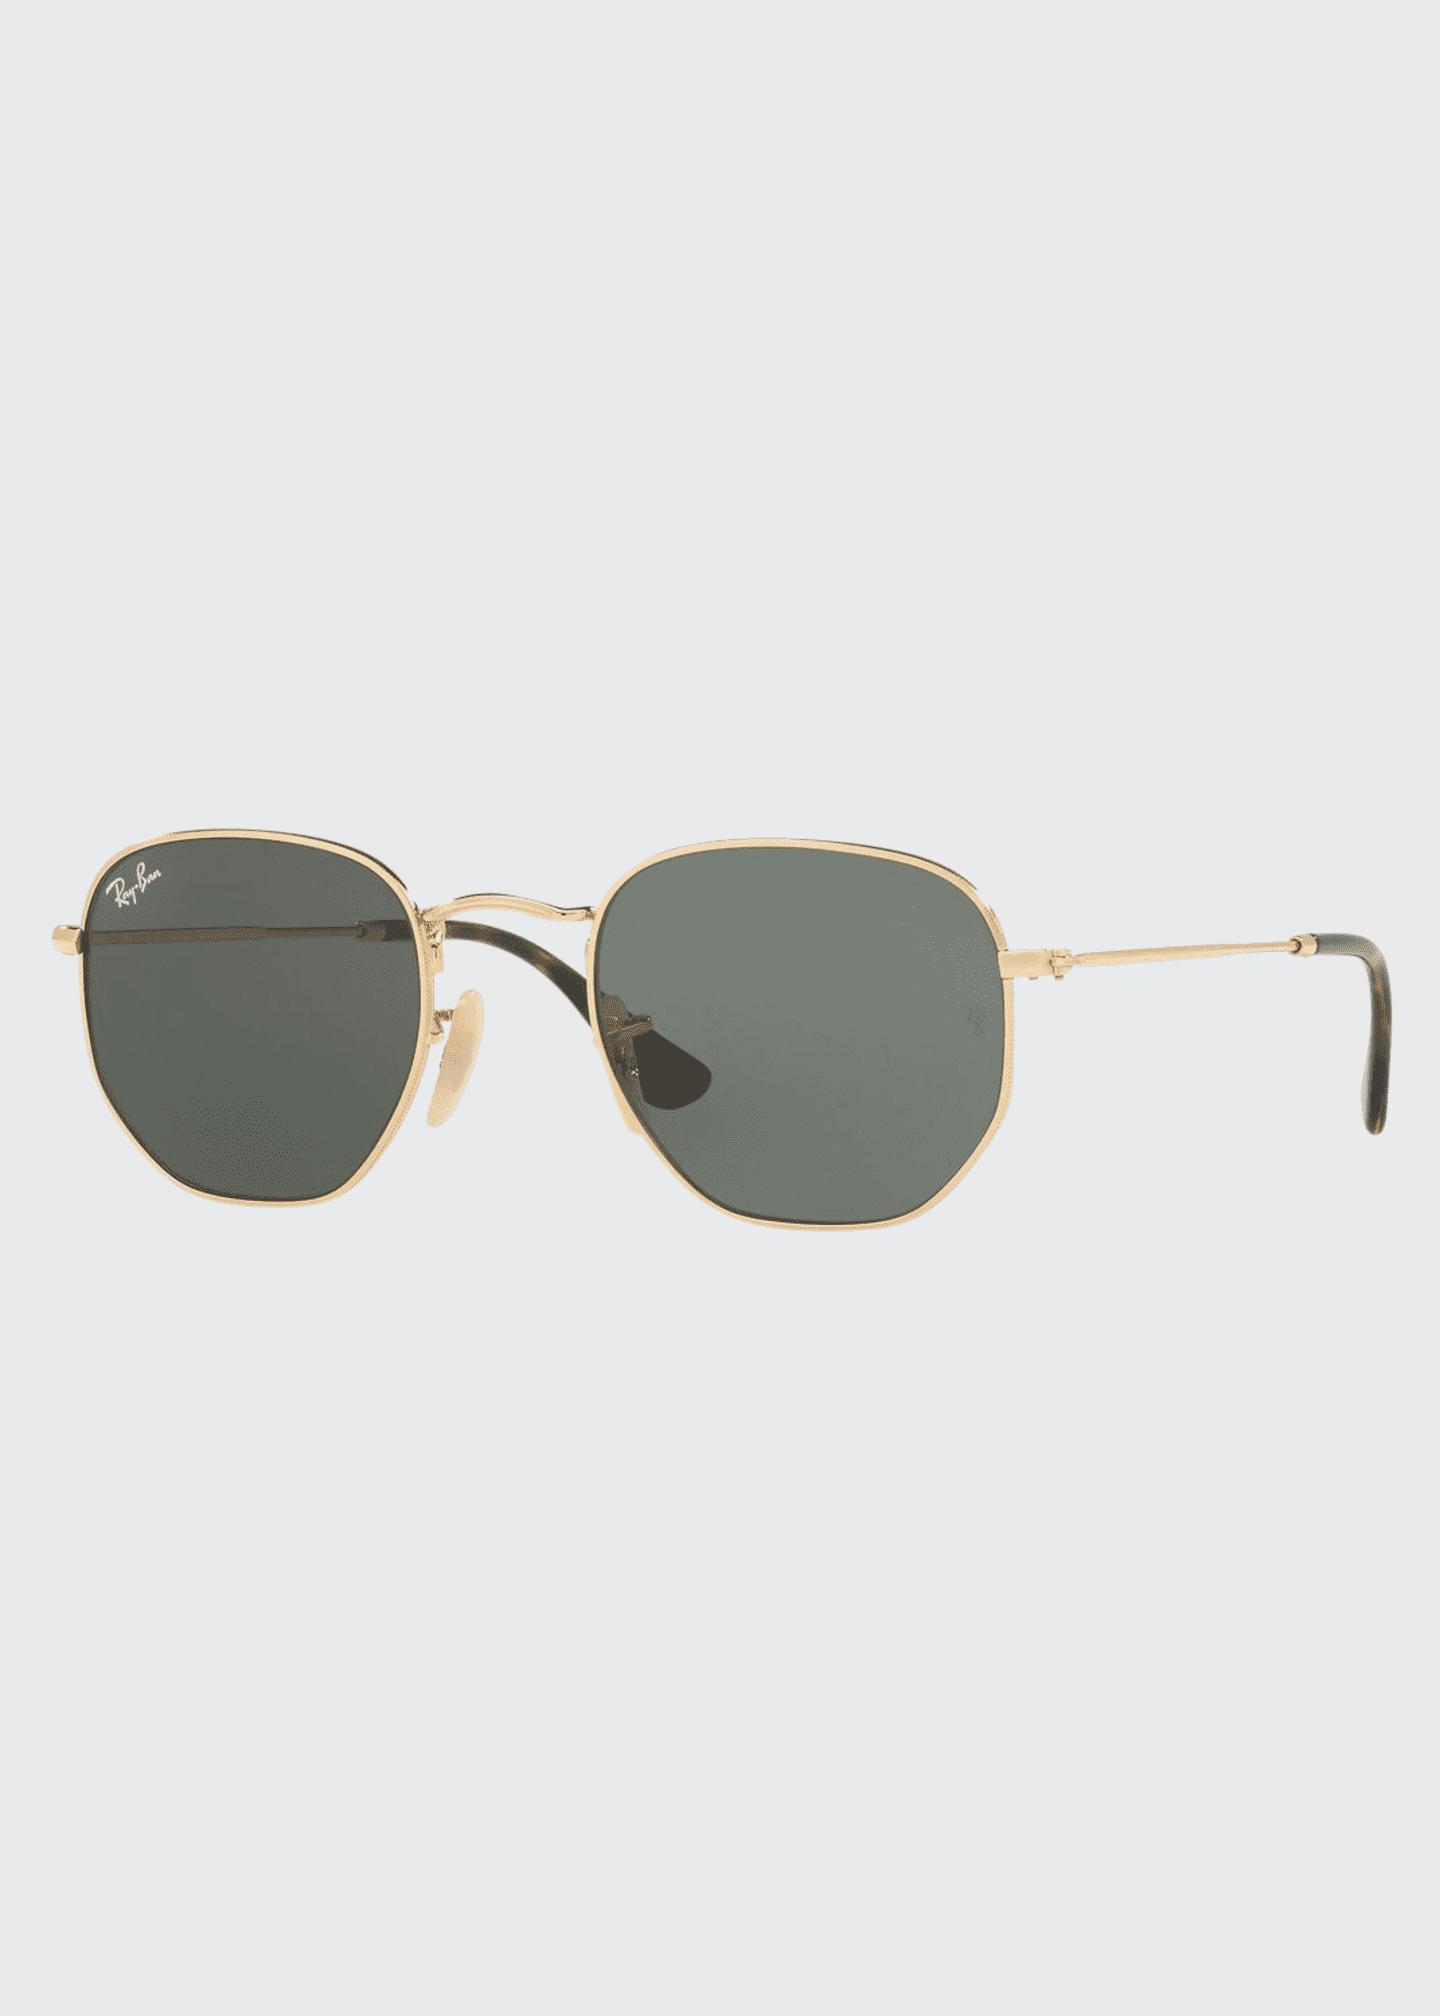 Ray-Ban Square Metal Keyhole Sunglasses